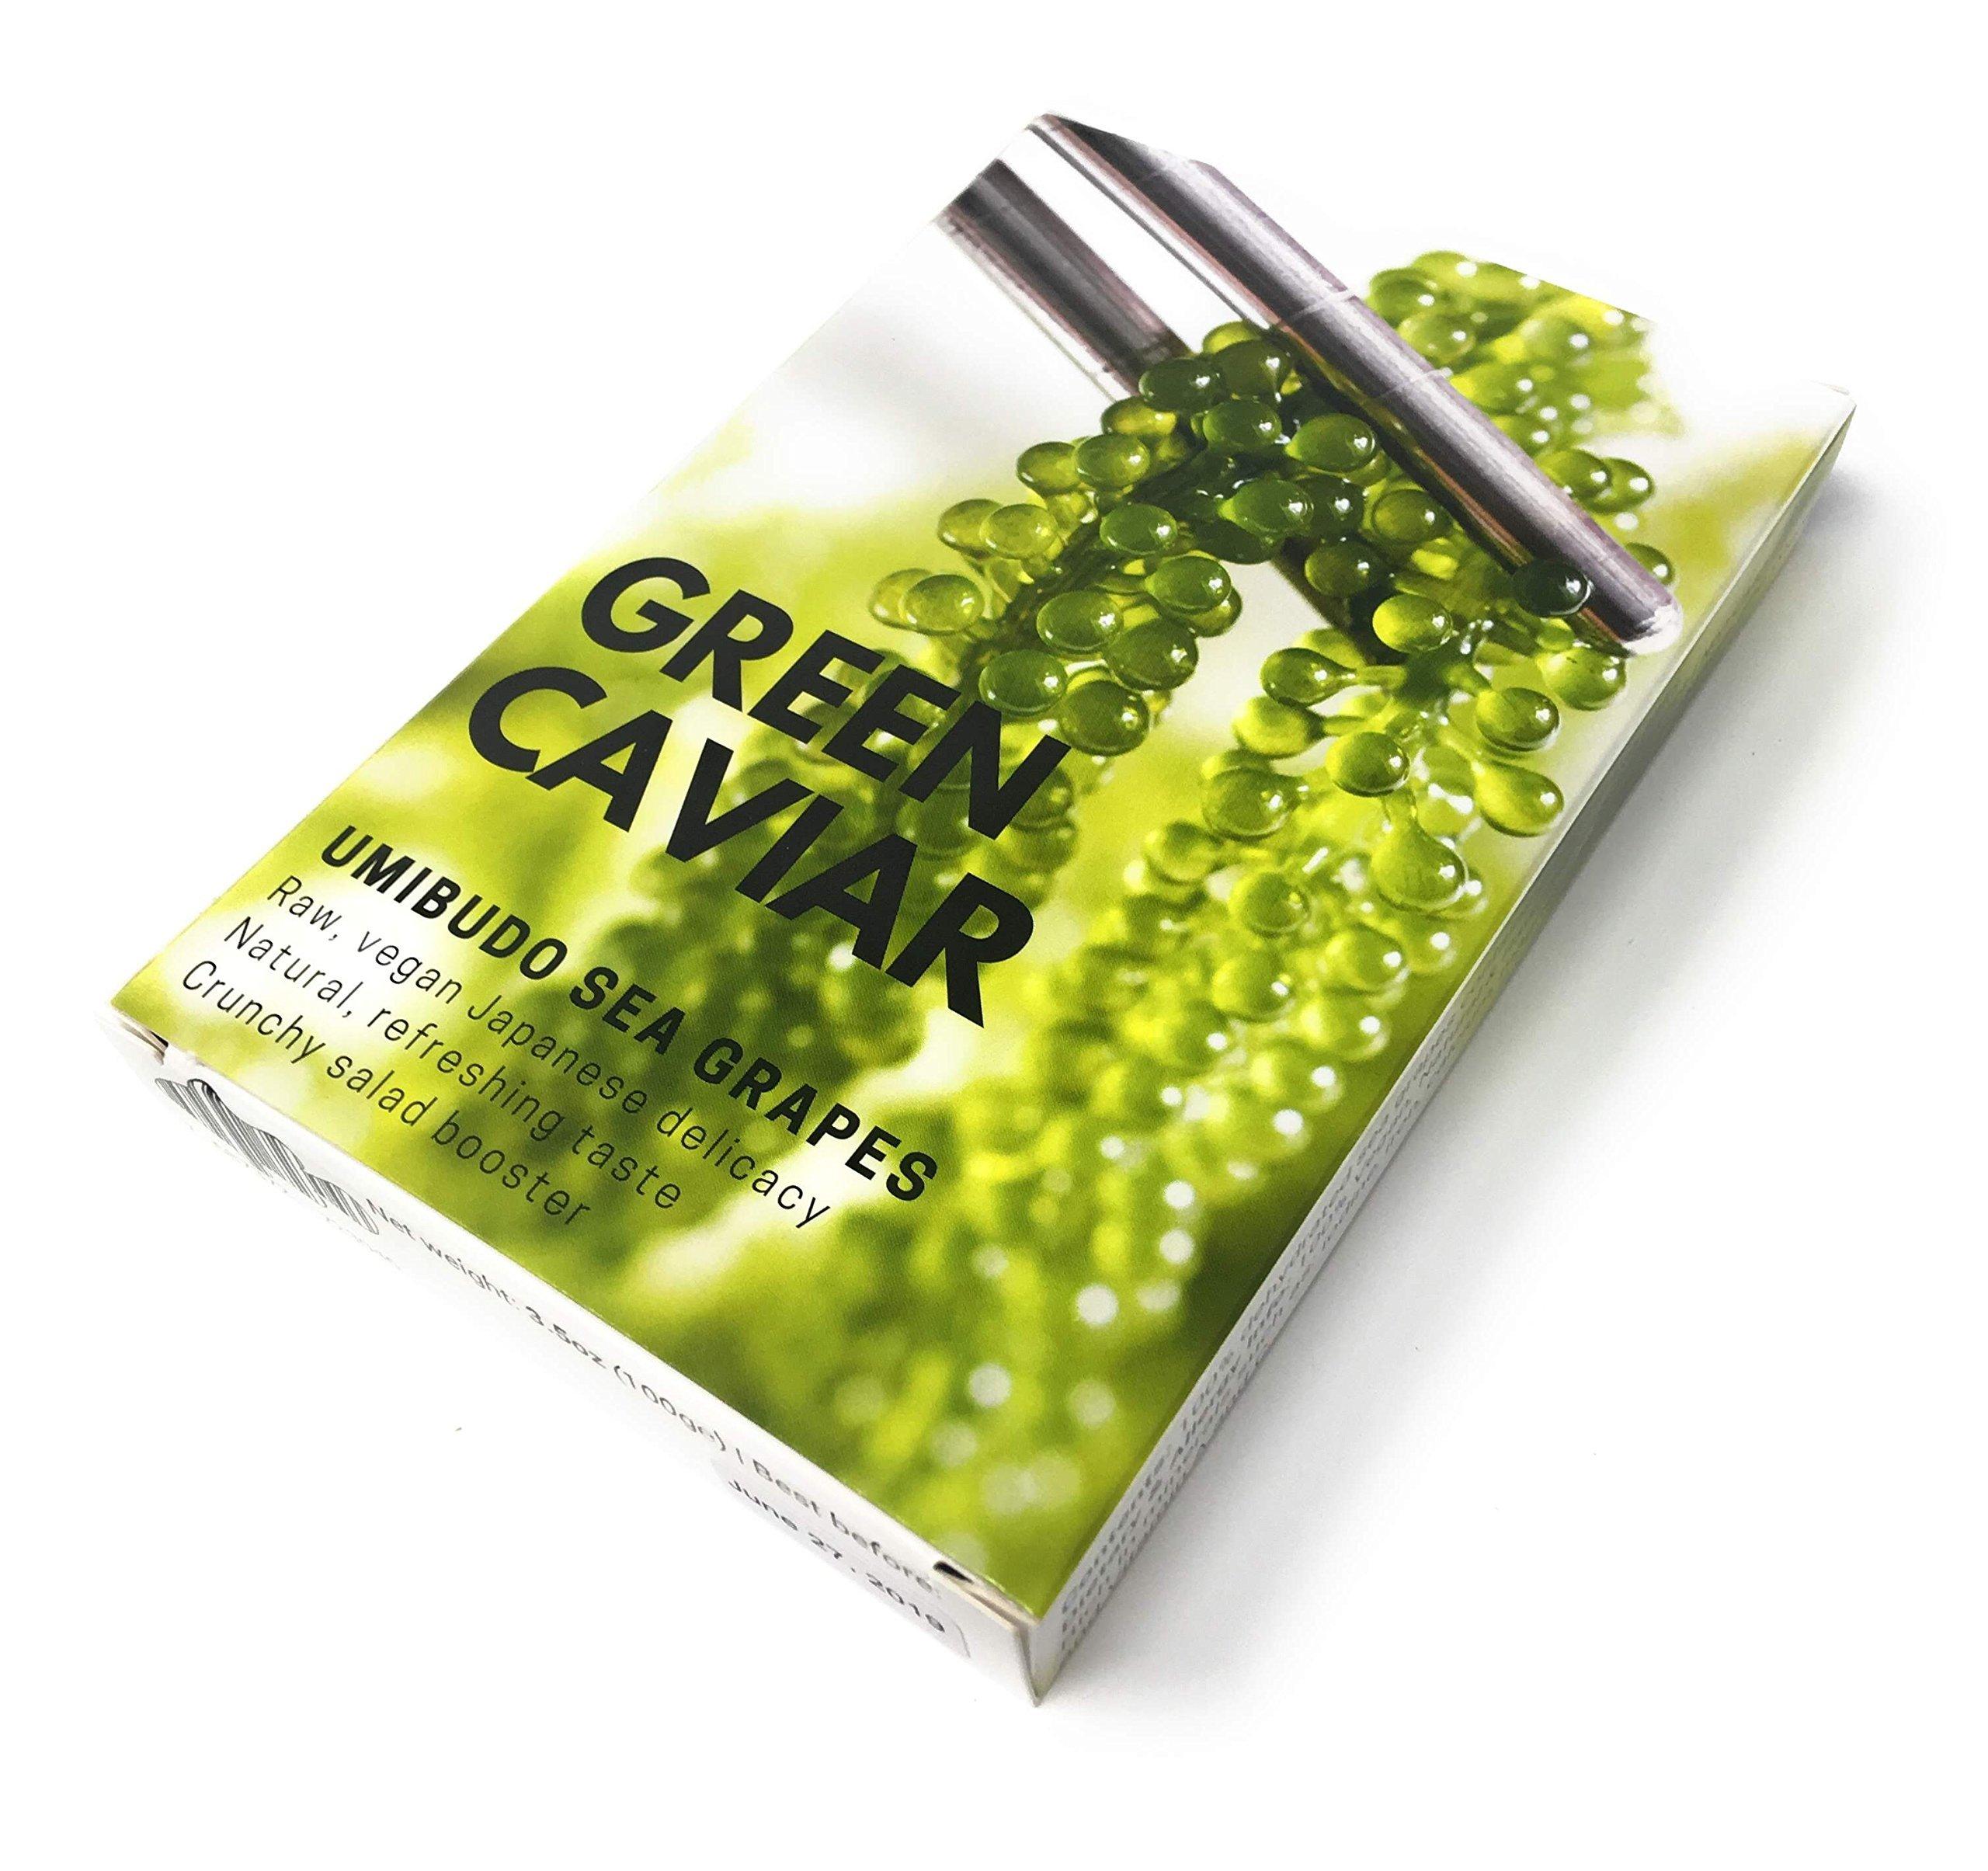 Green Caviar – Umibudo Sea Grapes | Japanese Delicacy Seaweed 3.5oz